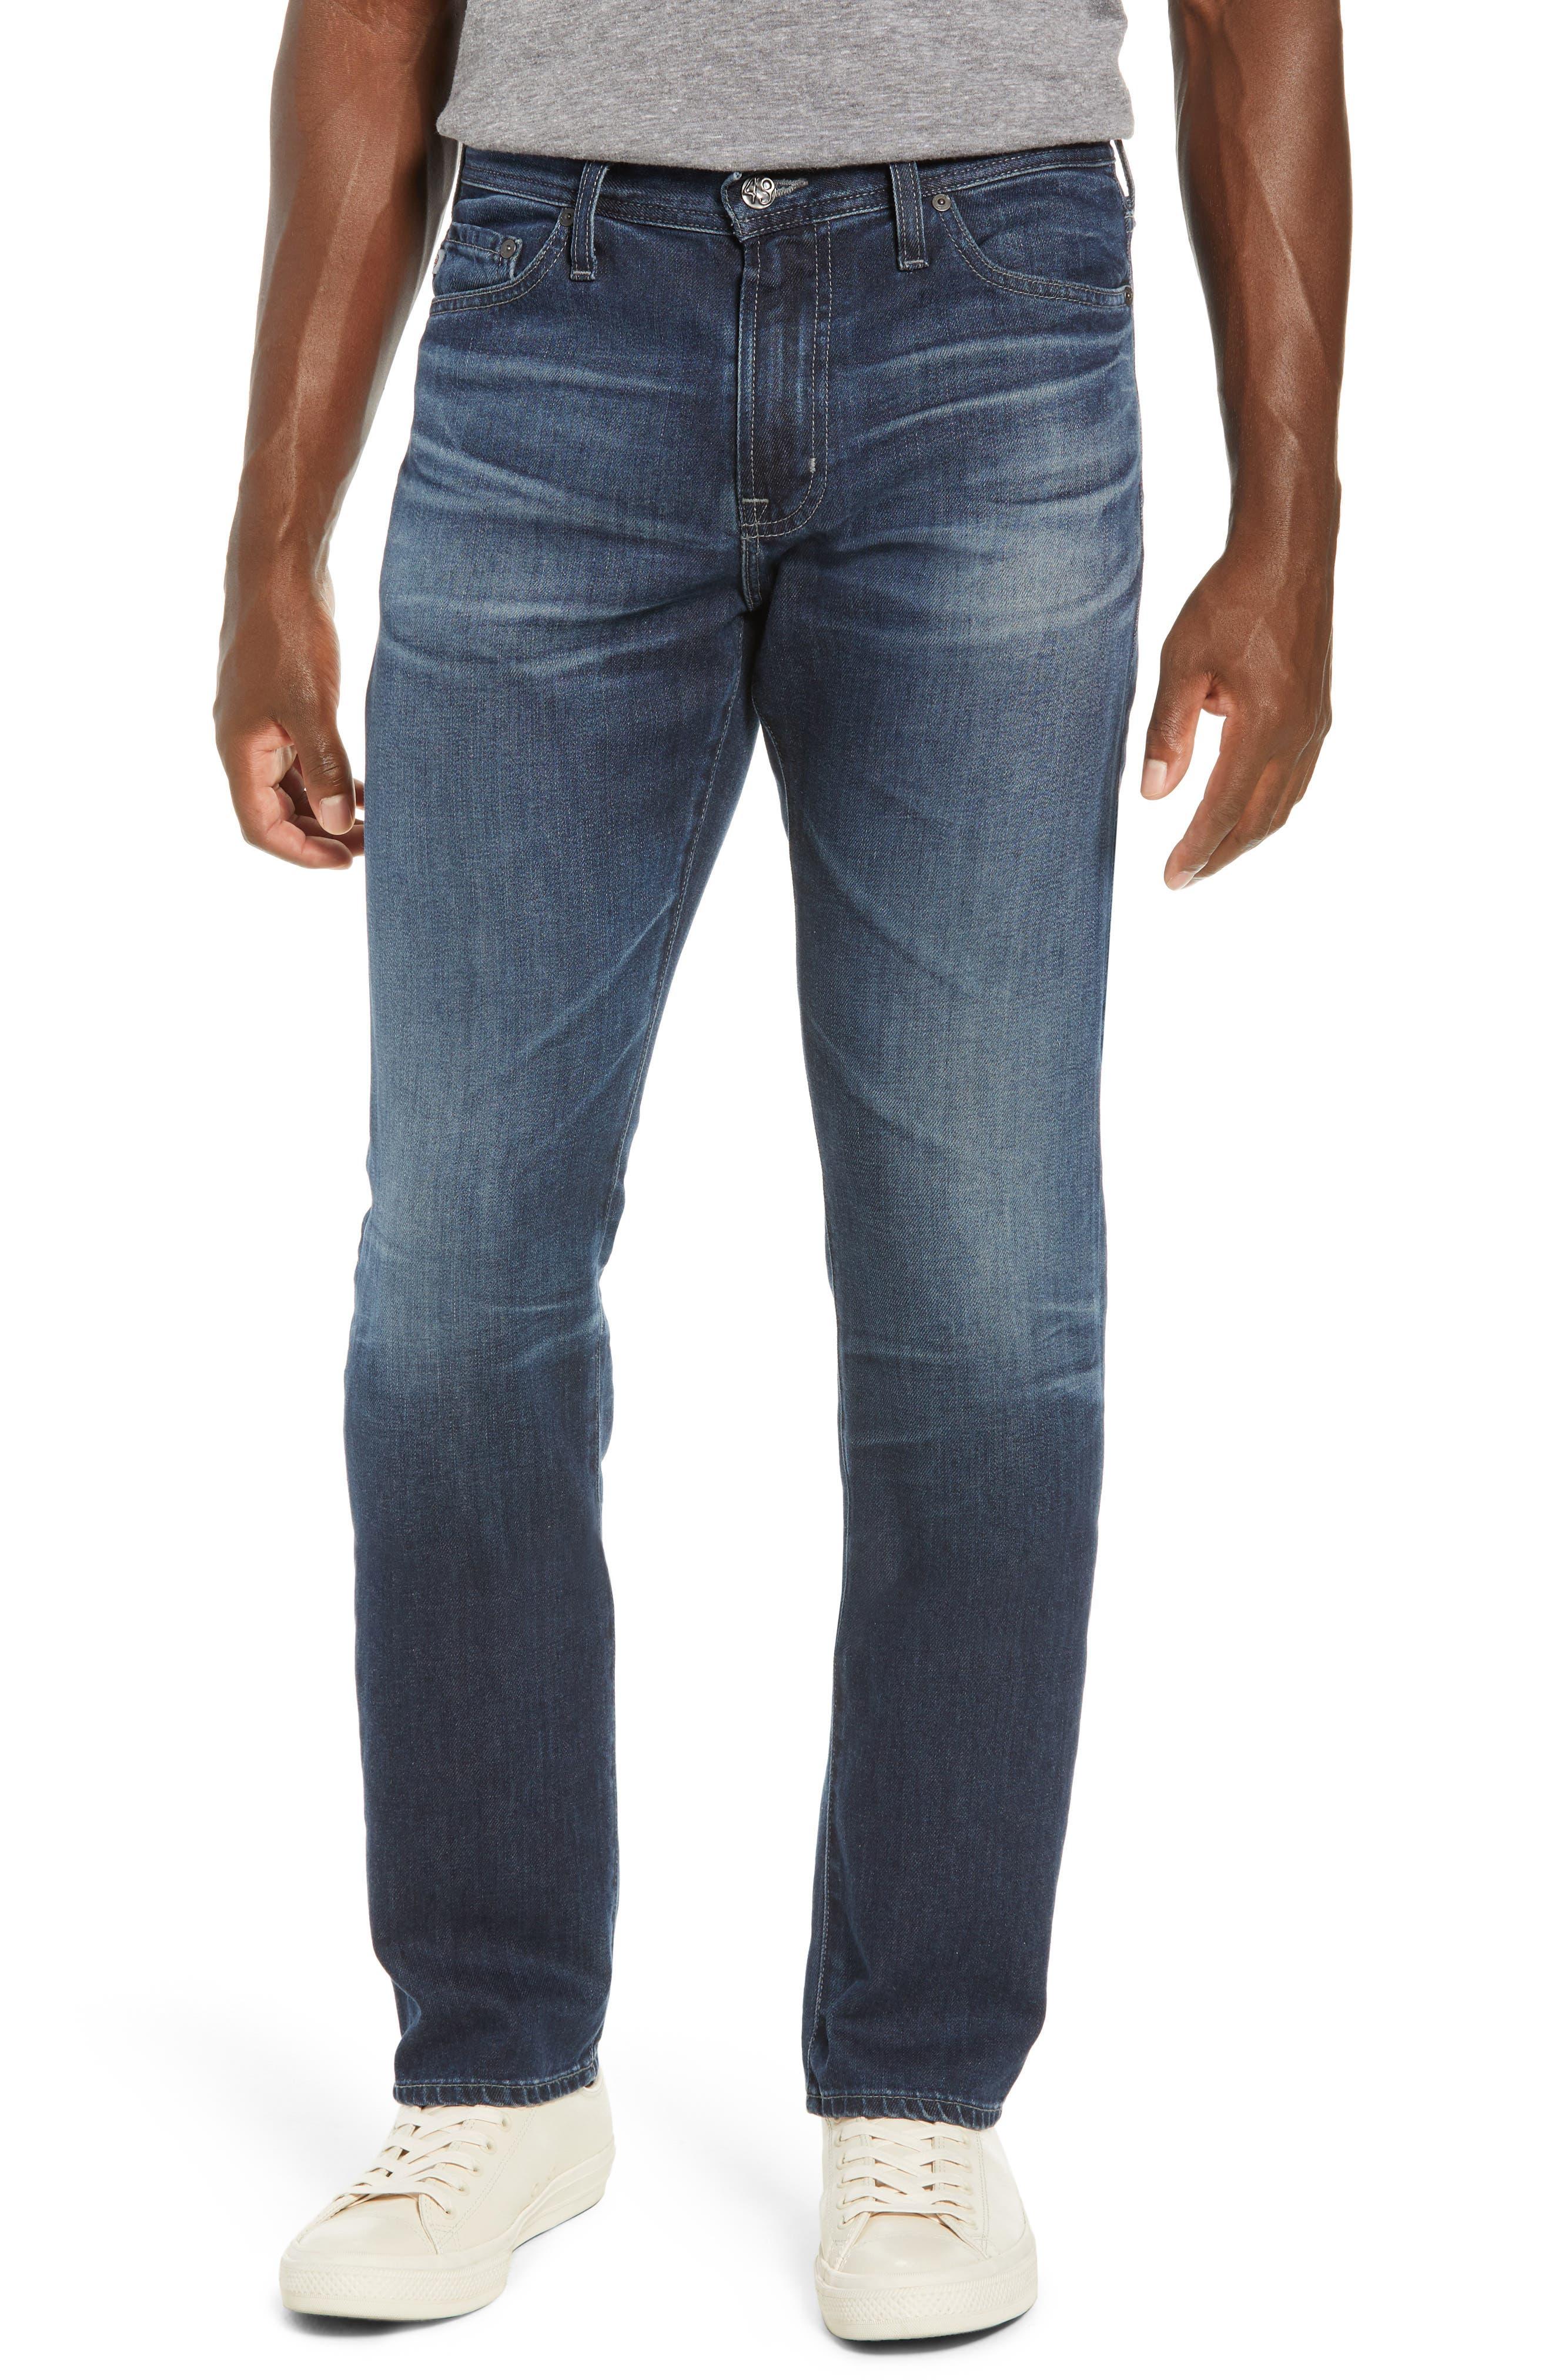 Everett Slim Straight Leg Jeans,                             Main thumbnail 1, color,                             7 YEARS PARK AVEUNE